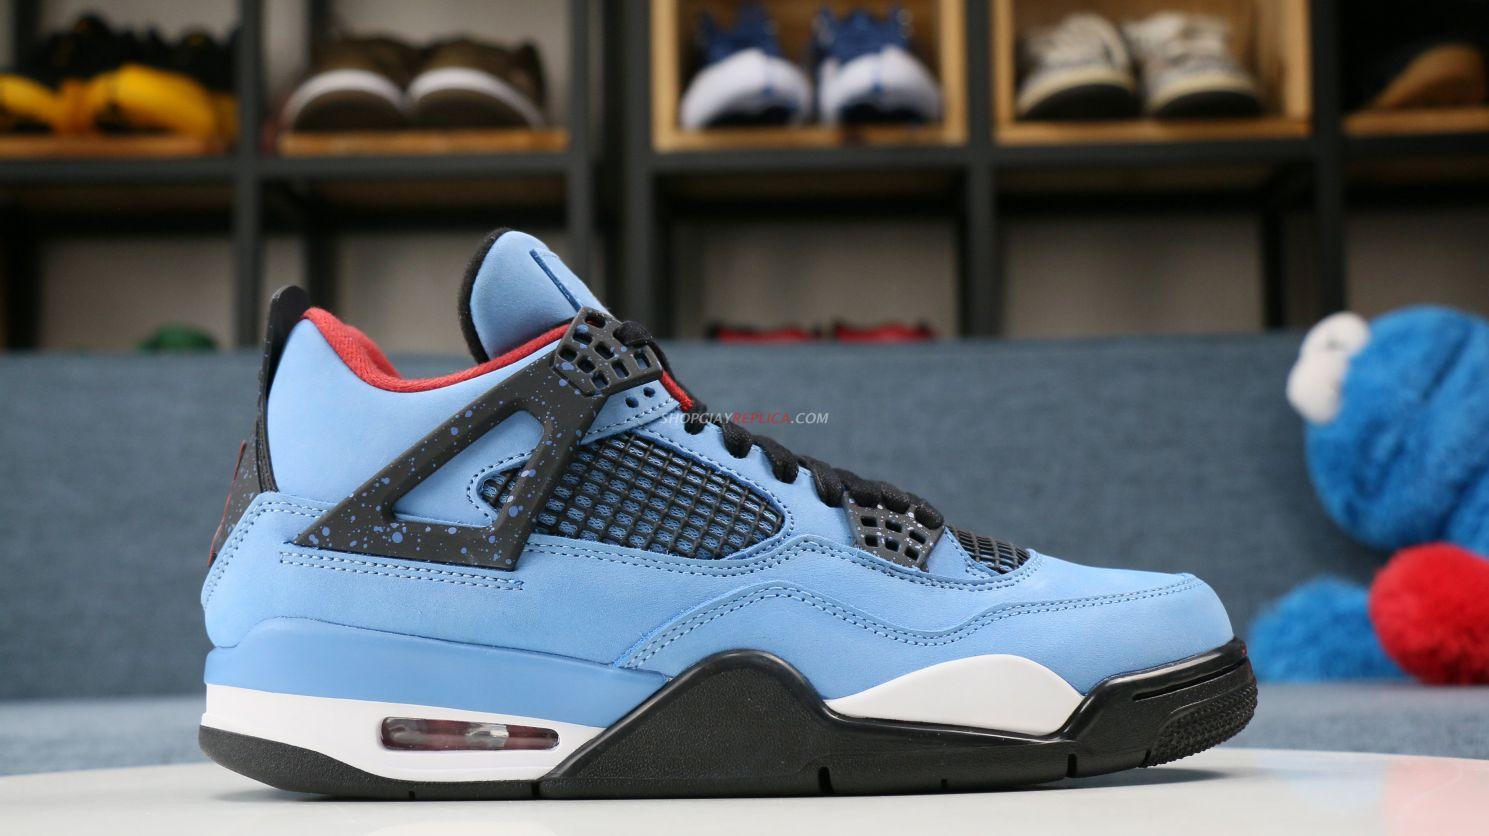 Giày Nike Air Jordan 4 Travis Scott Like Auth